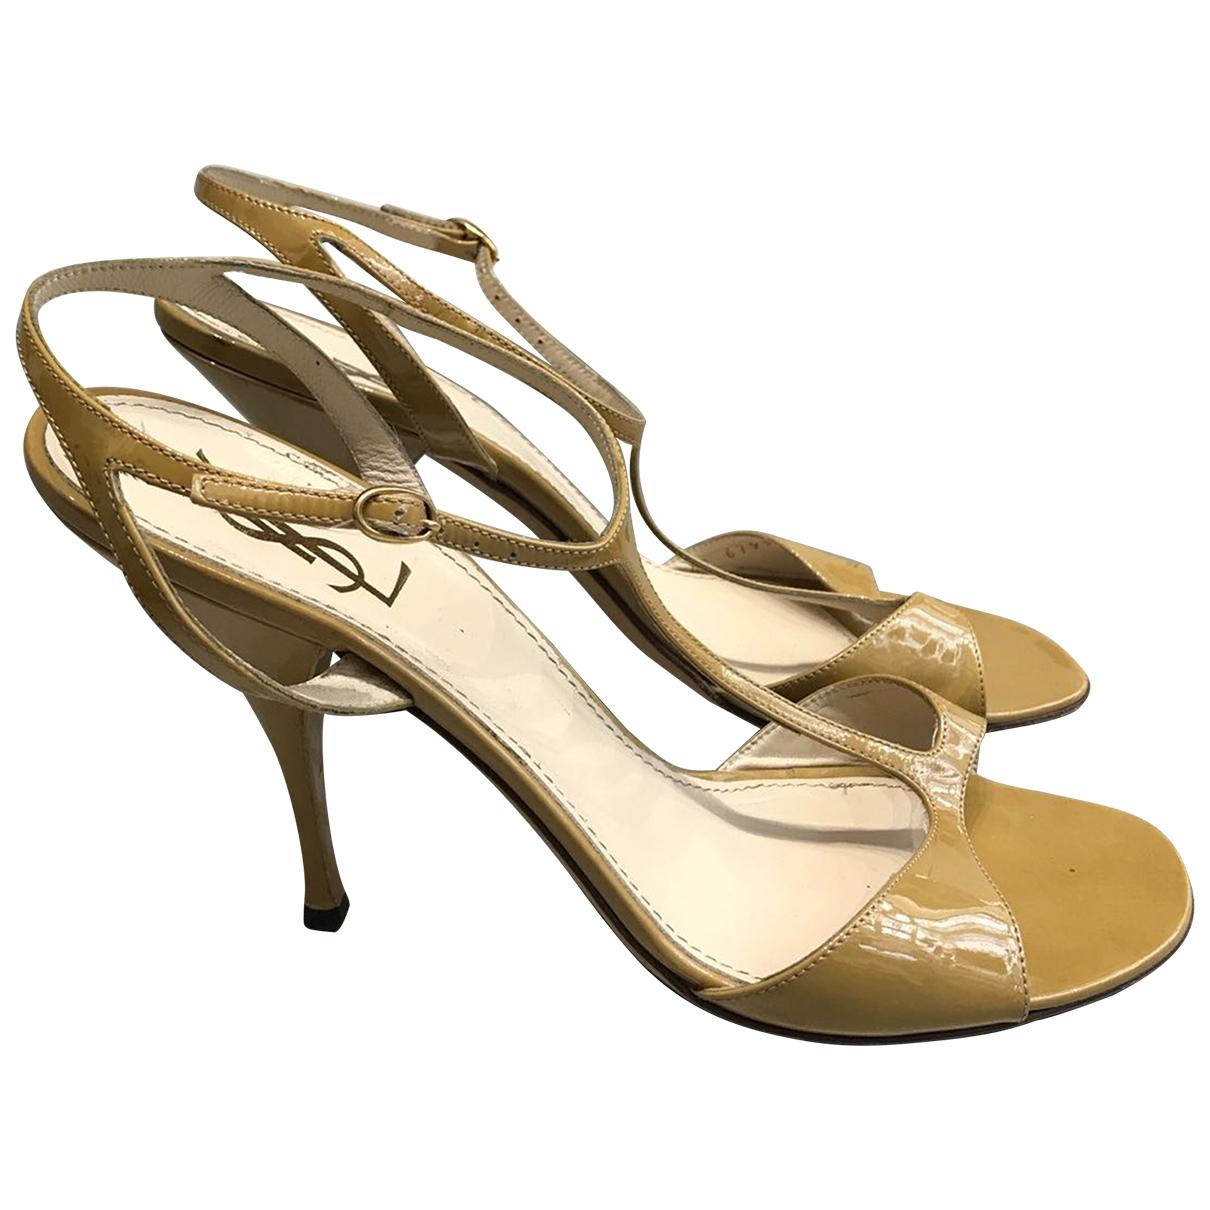 Sandalias de Charol Yves Saint Laurent